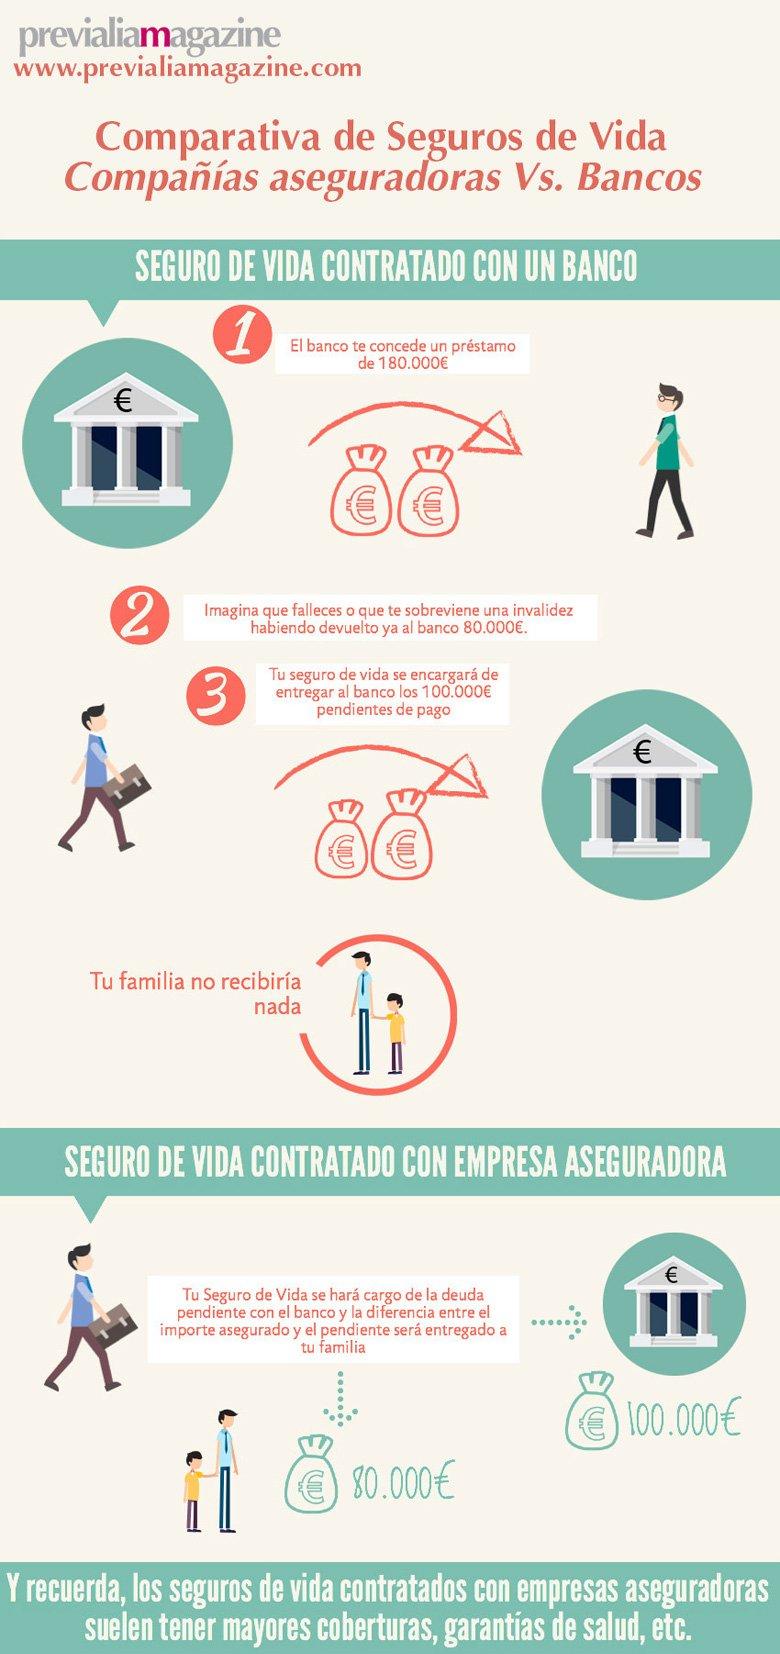 Comparativa Seguros de Vida: Entidades Aseguradoras Vs. Bancos